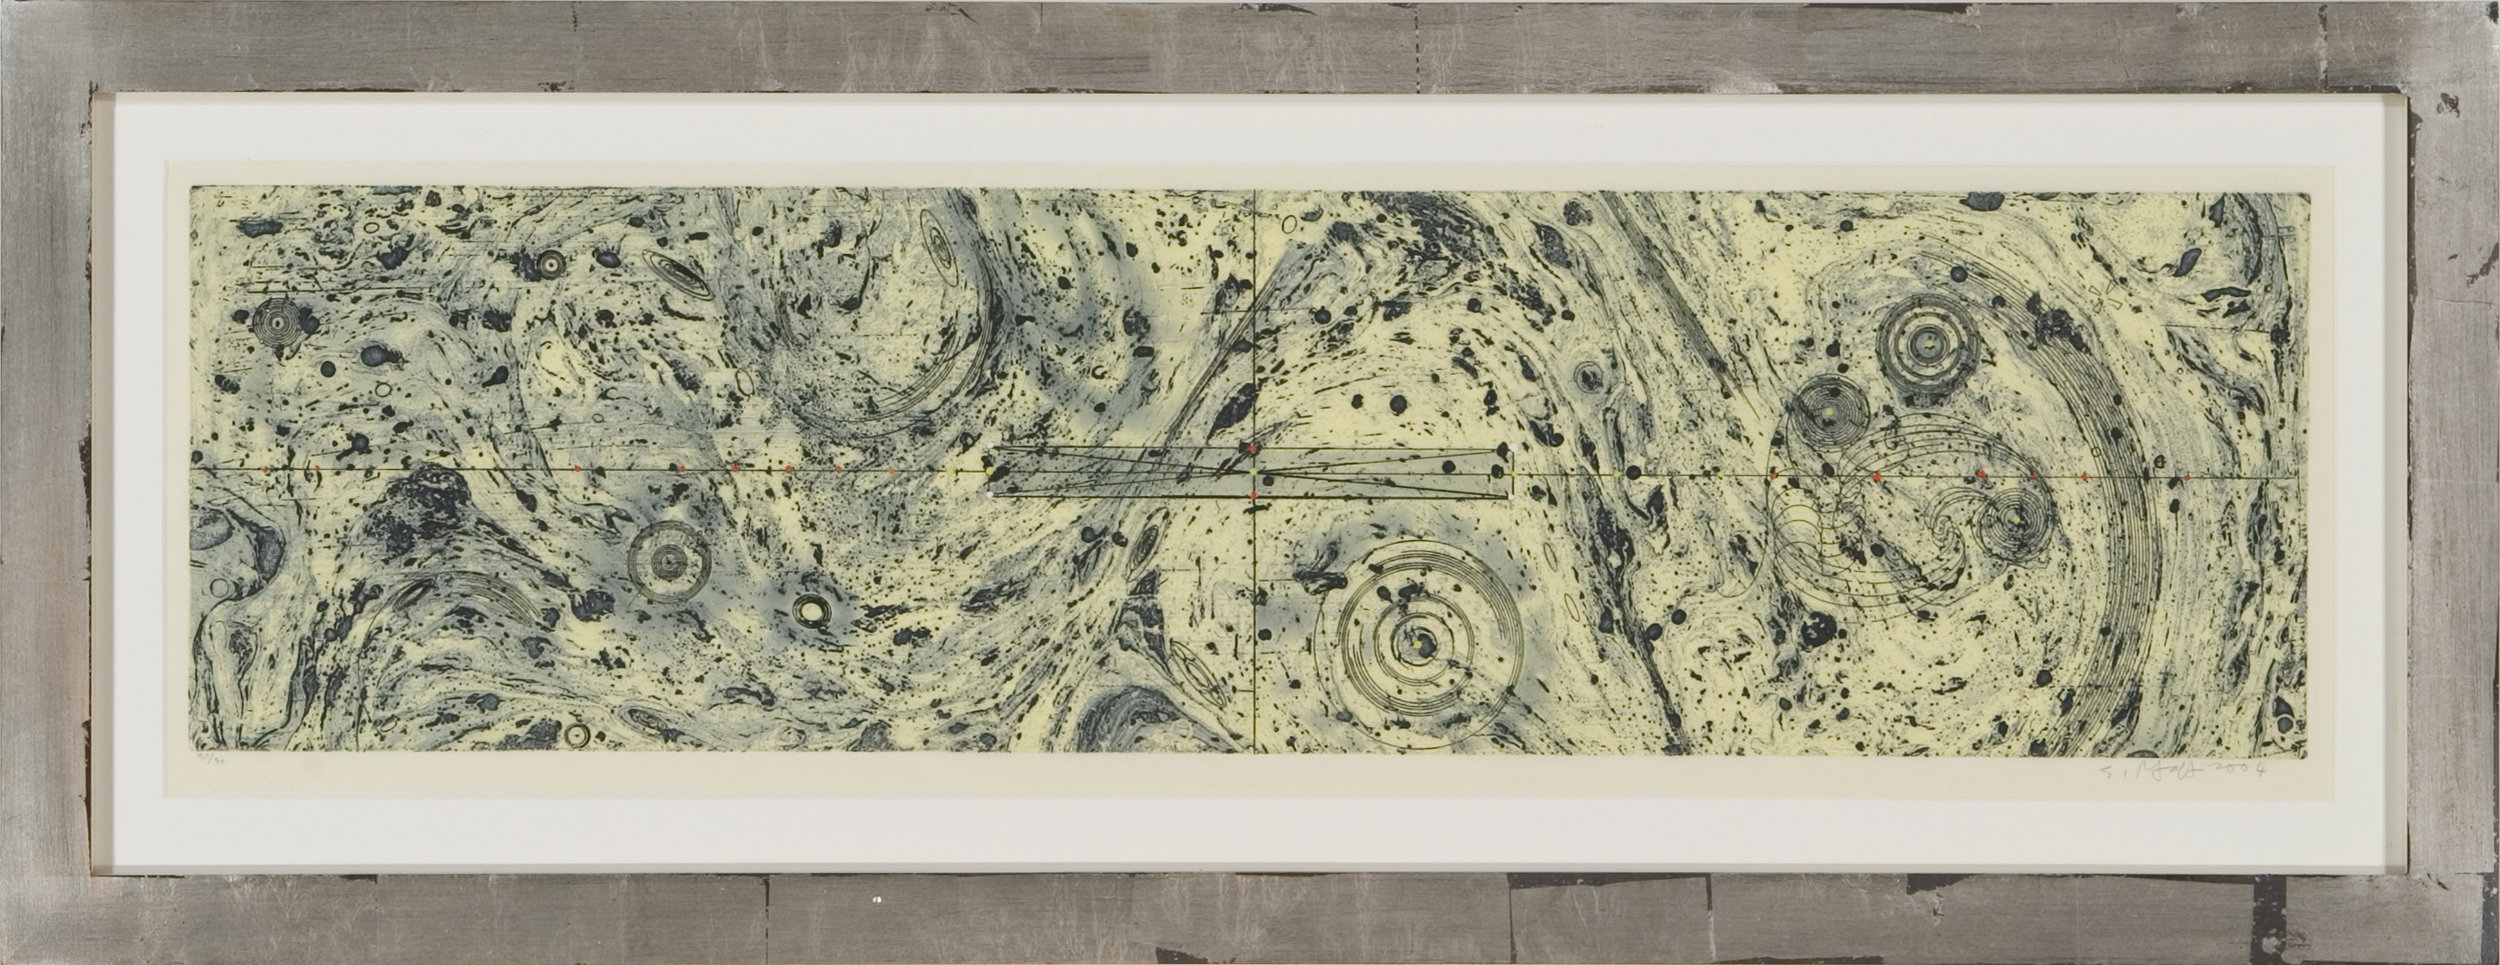 Untitled (marbleized), 2004